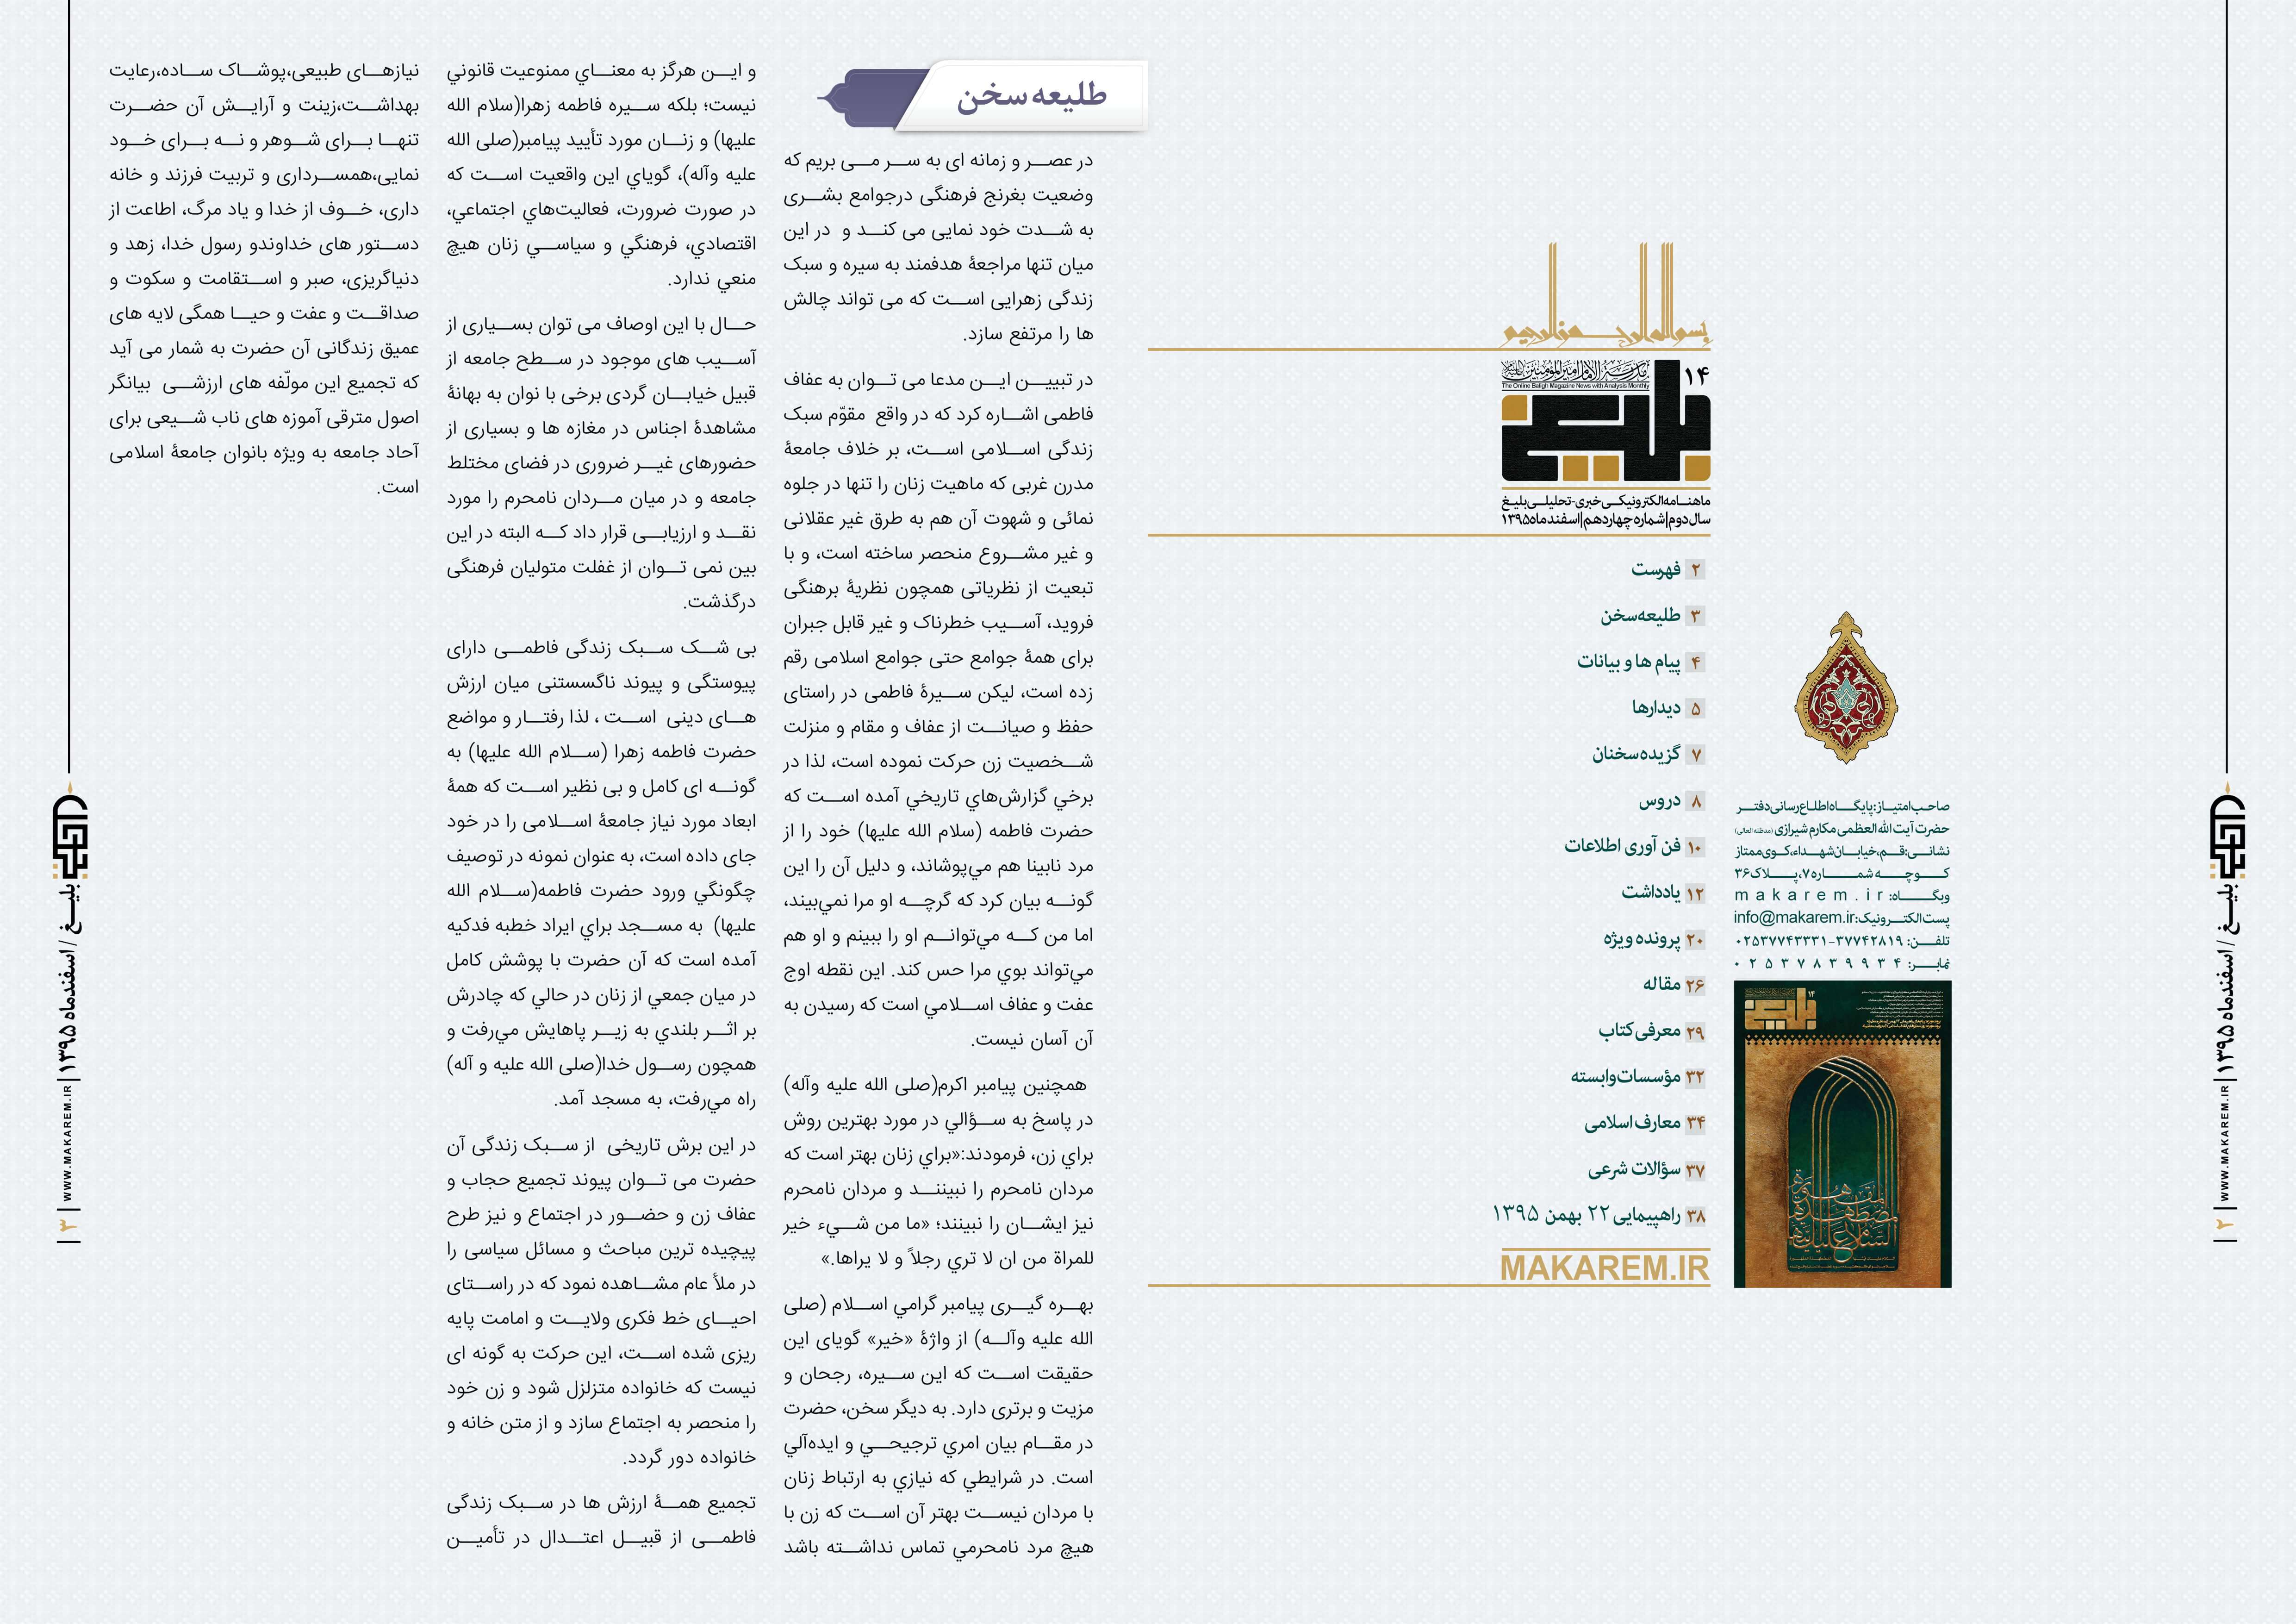 طلیعه سخن-مدرسه الامام امیر المومنین (ع)